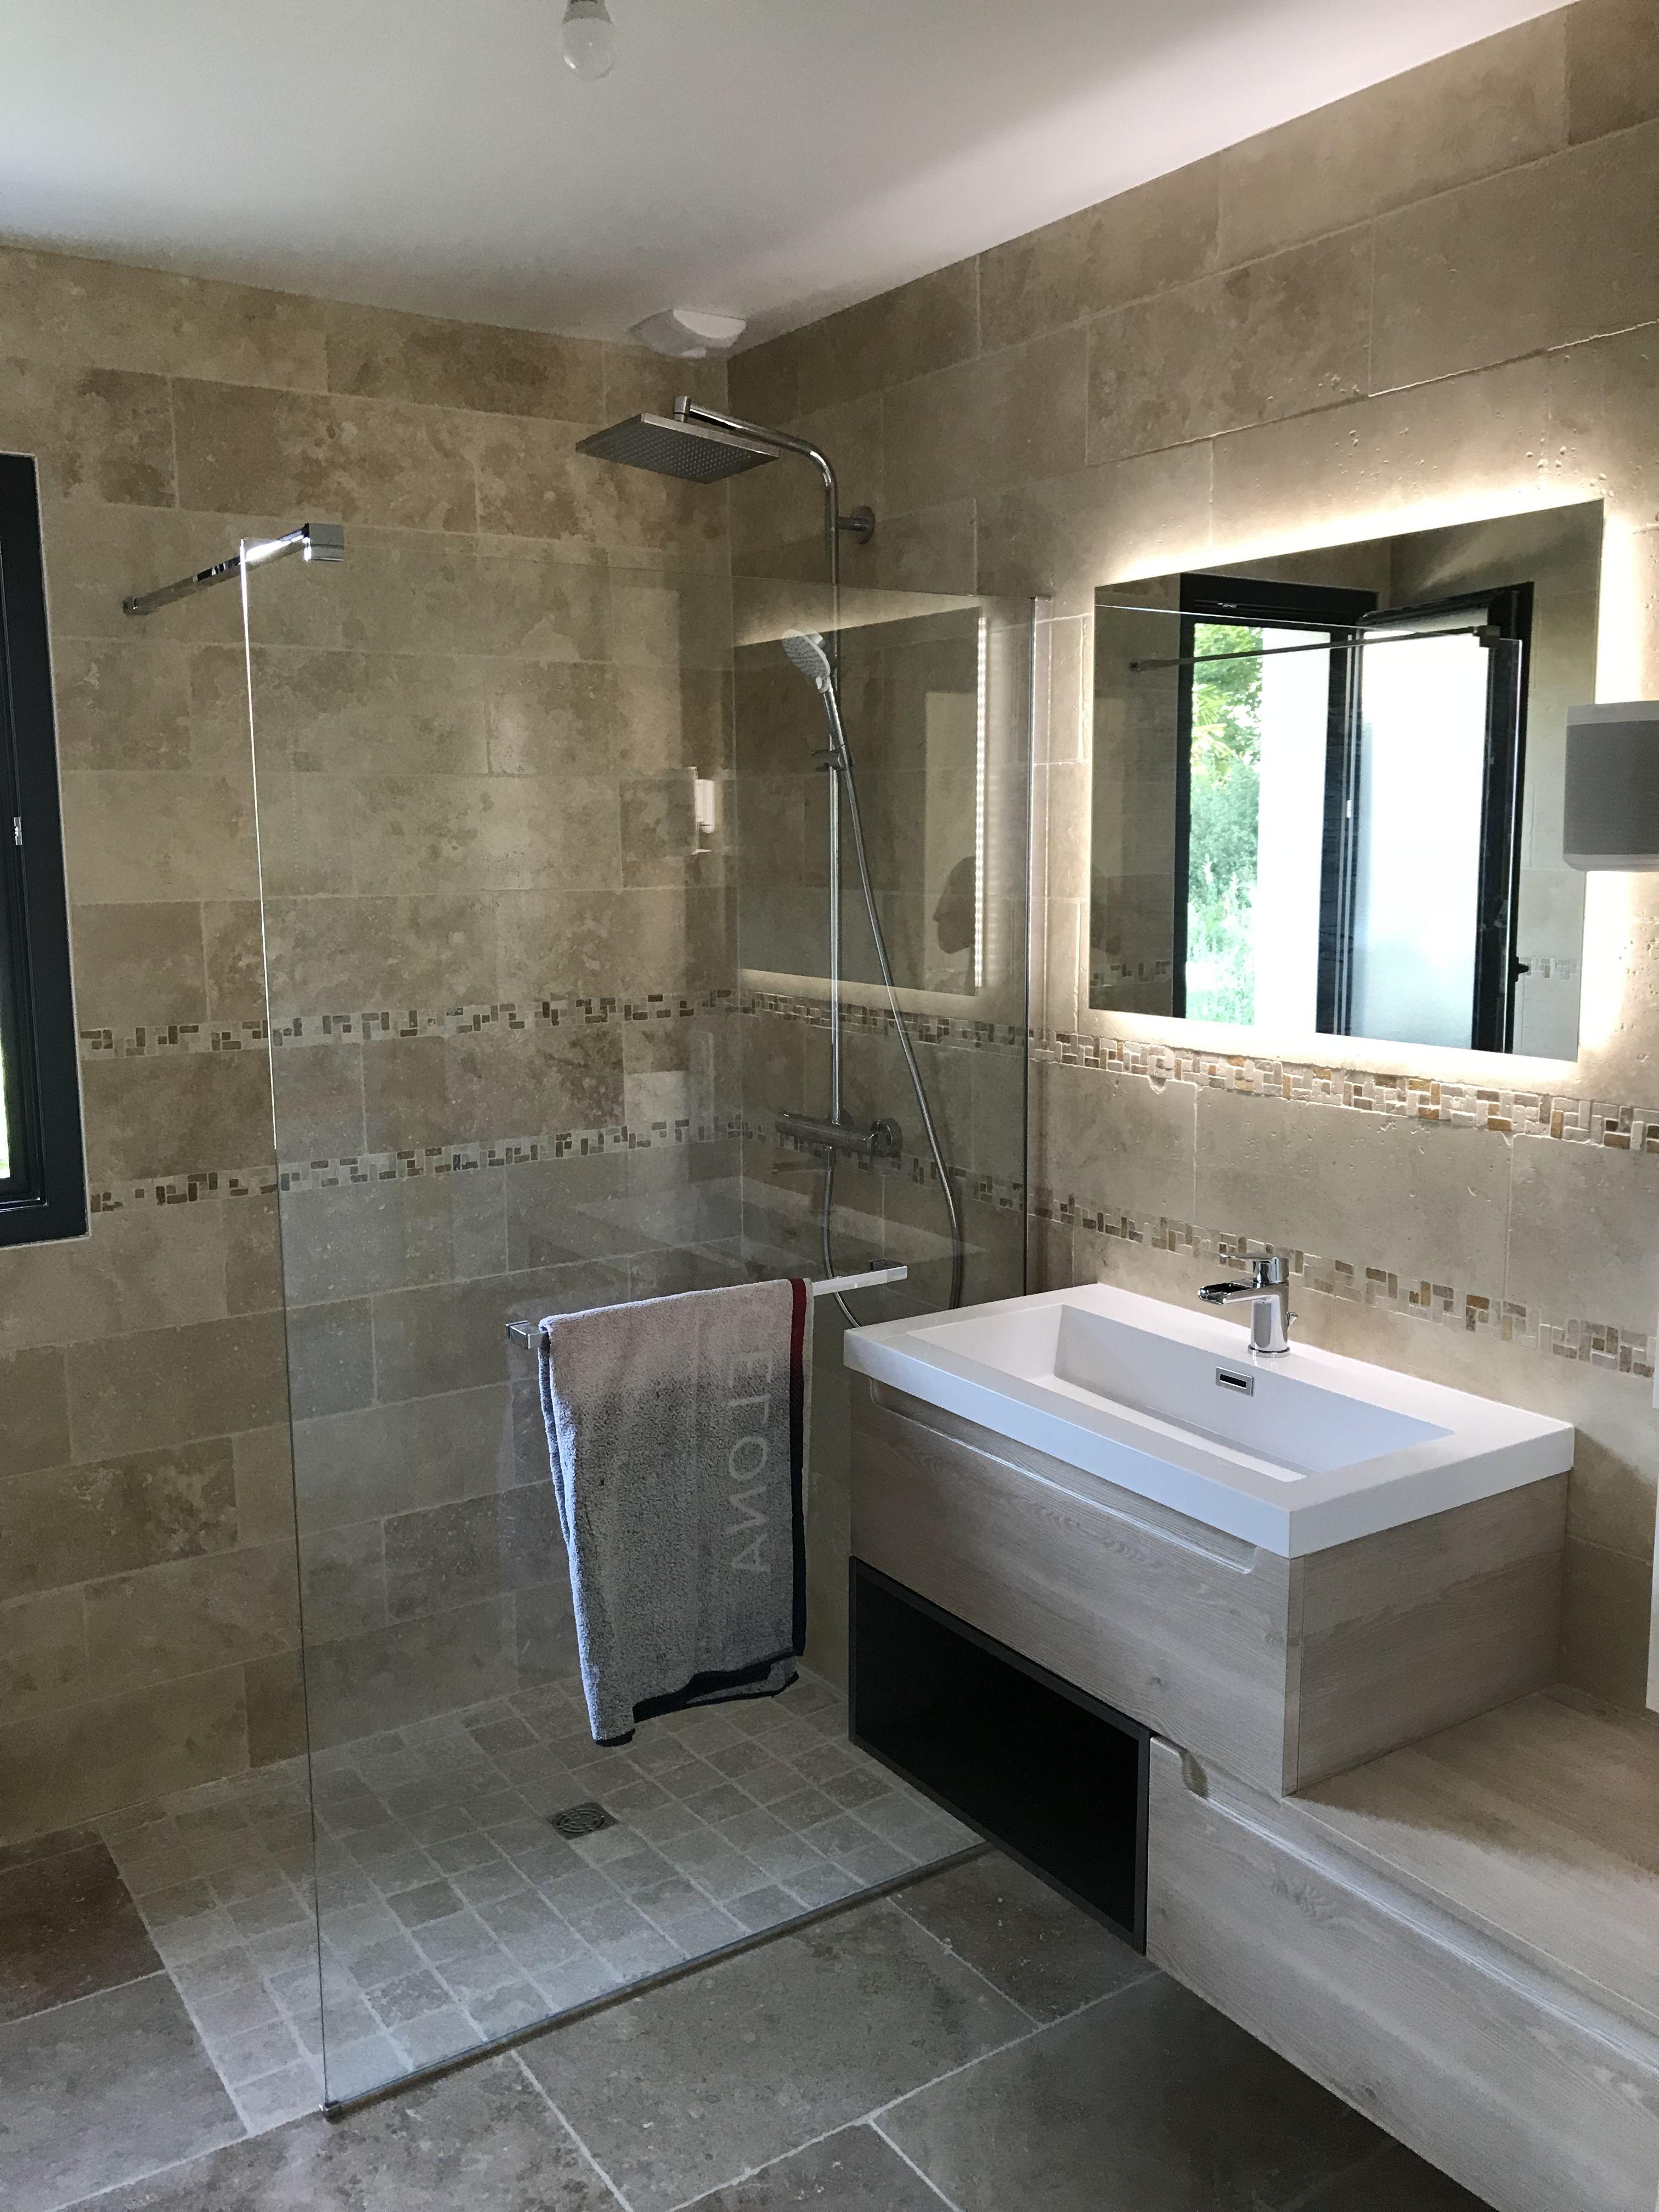 Salle de bain travertin  Salle de bain travertin, Idée salle de